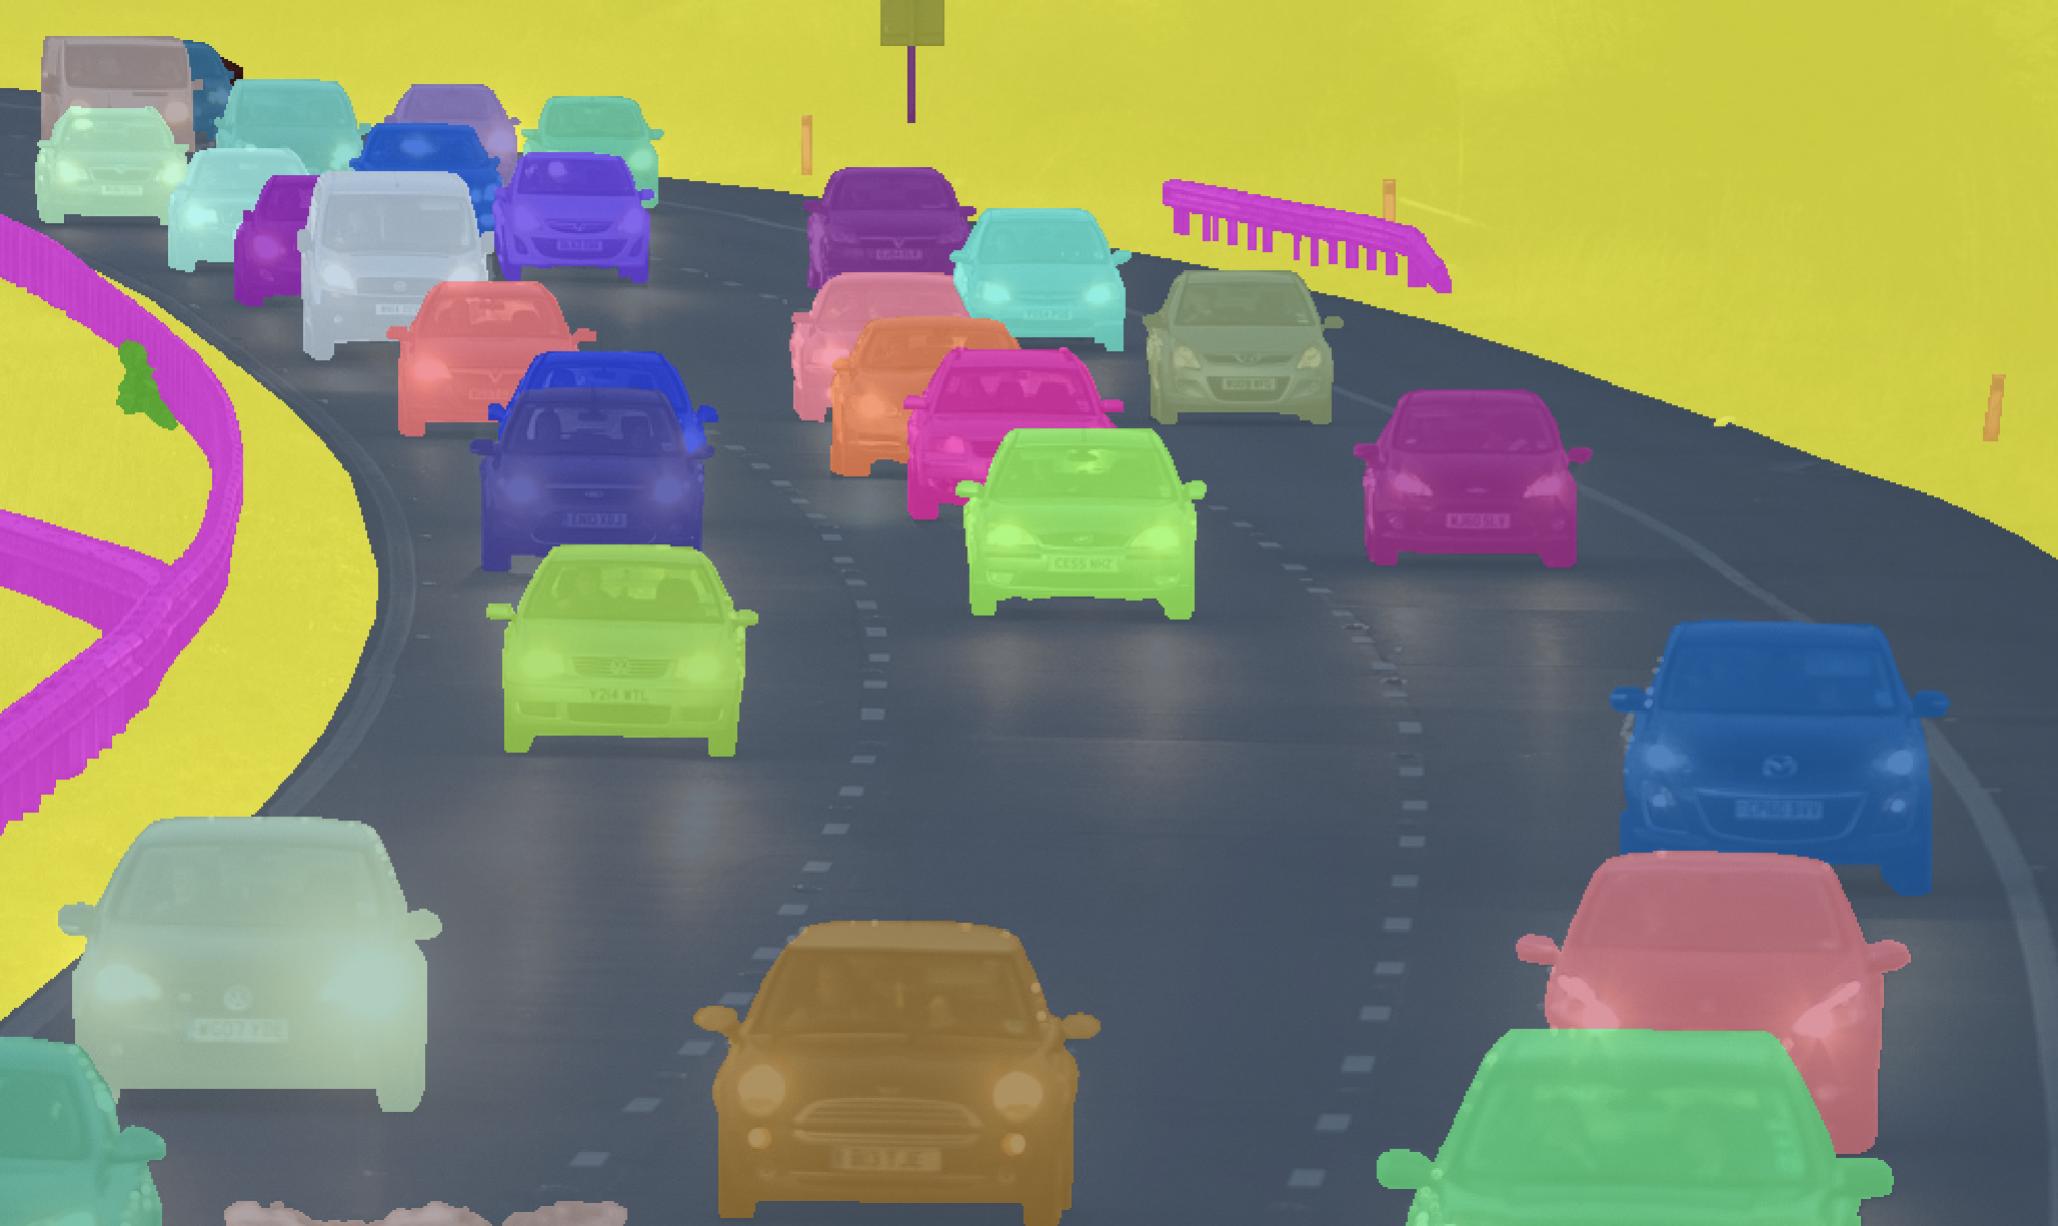 Semantic Instance Segmented street scene